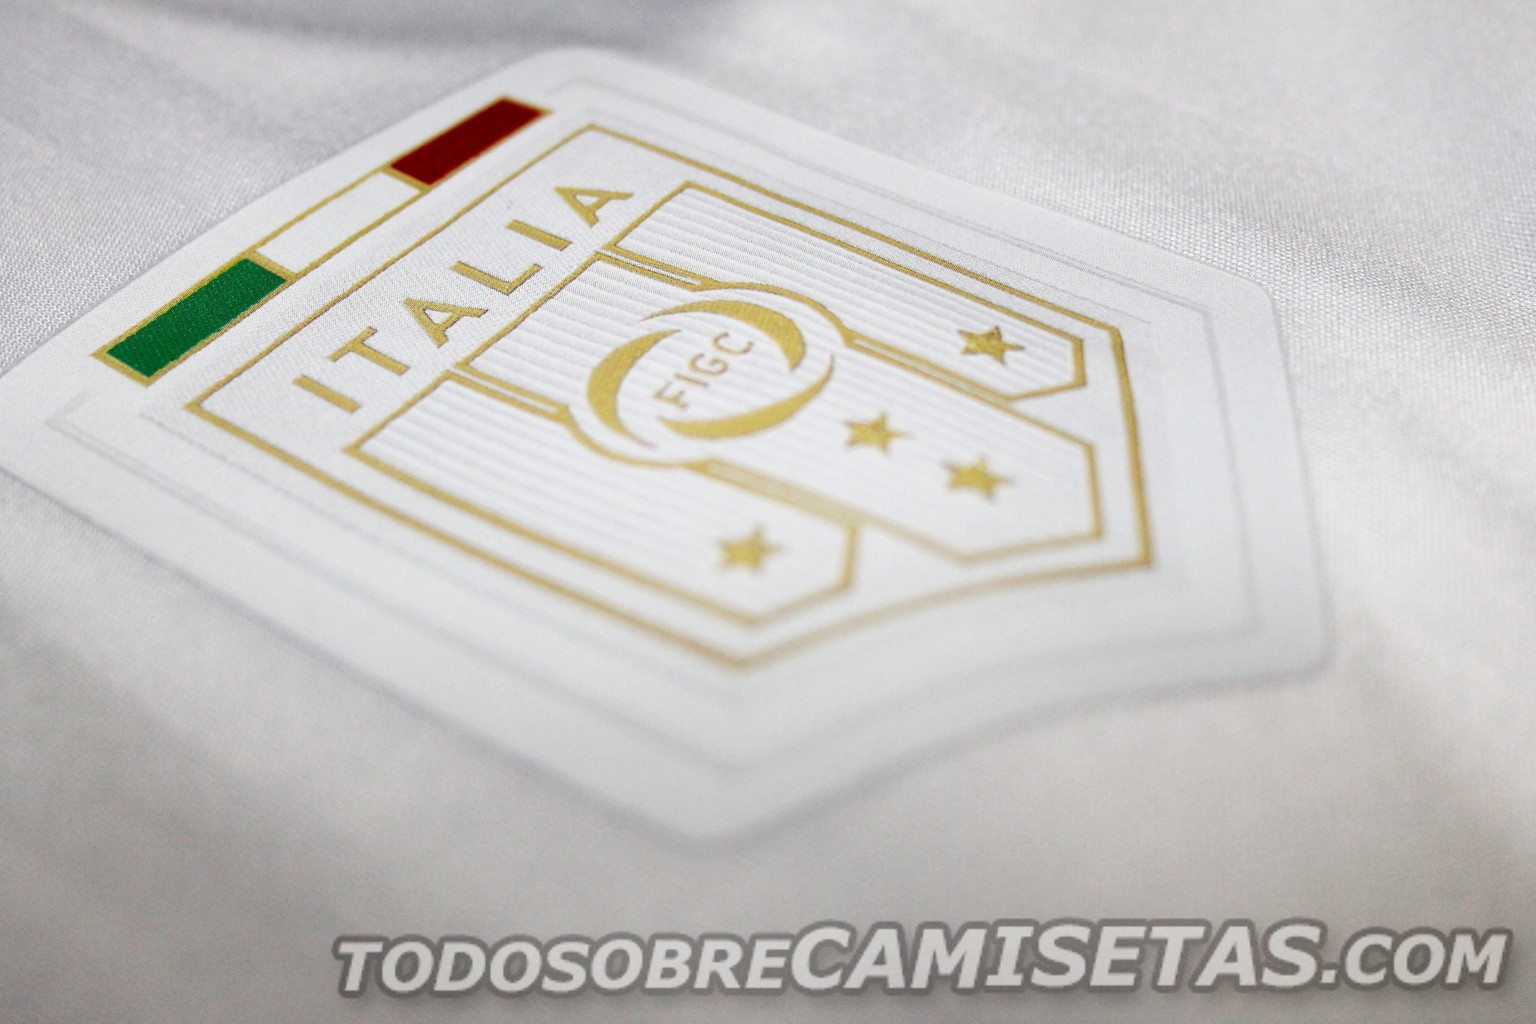 Italy-2016-PUMA-tribute-away-kit-9.jpg